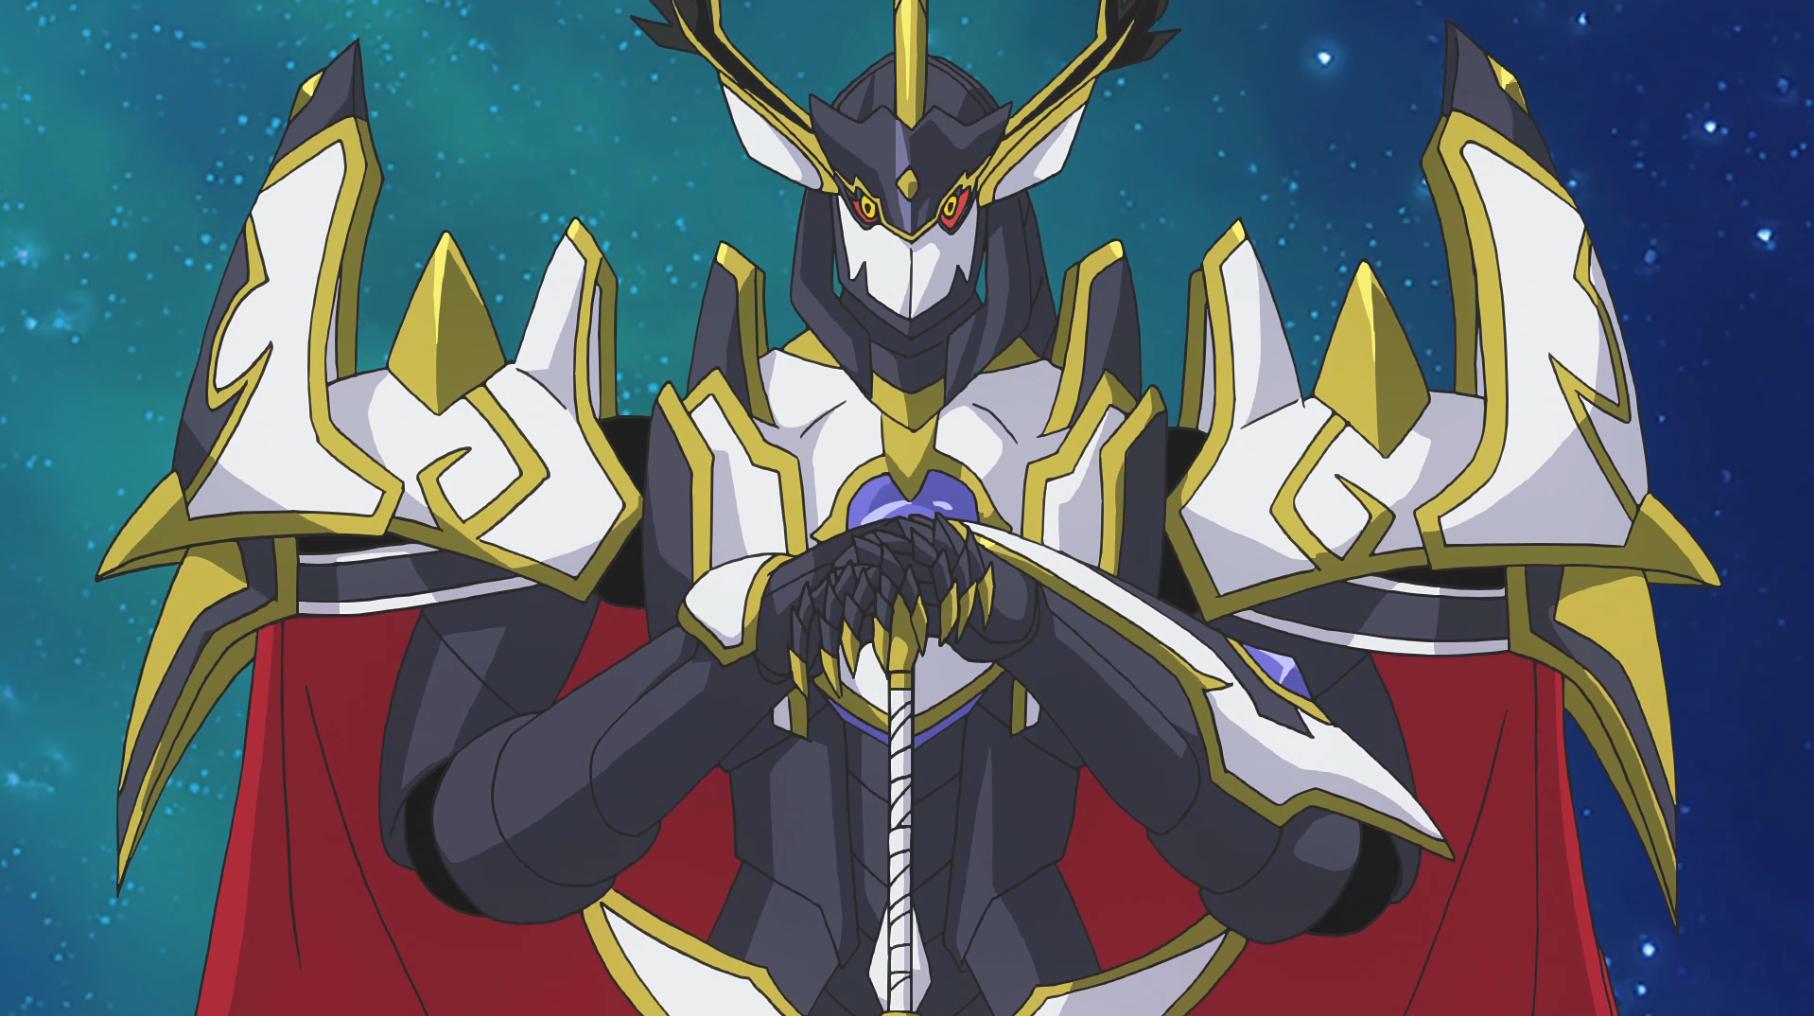 Black Dragon Knight, Geil (character)